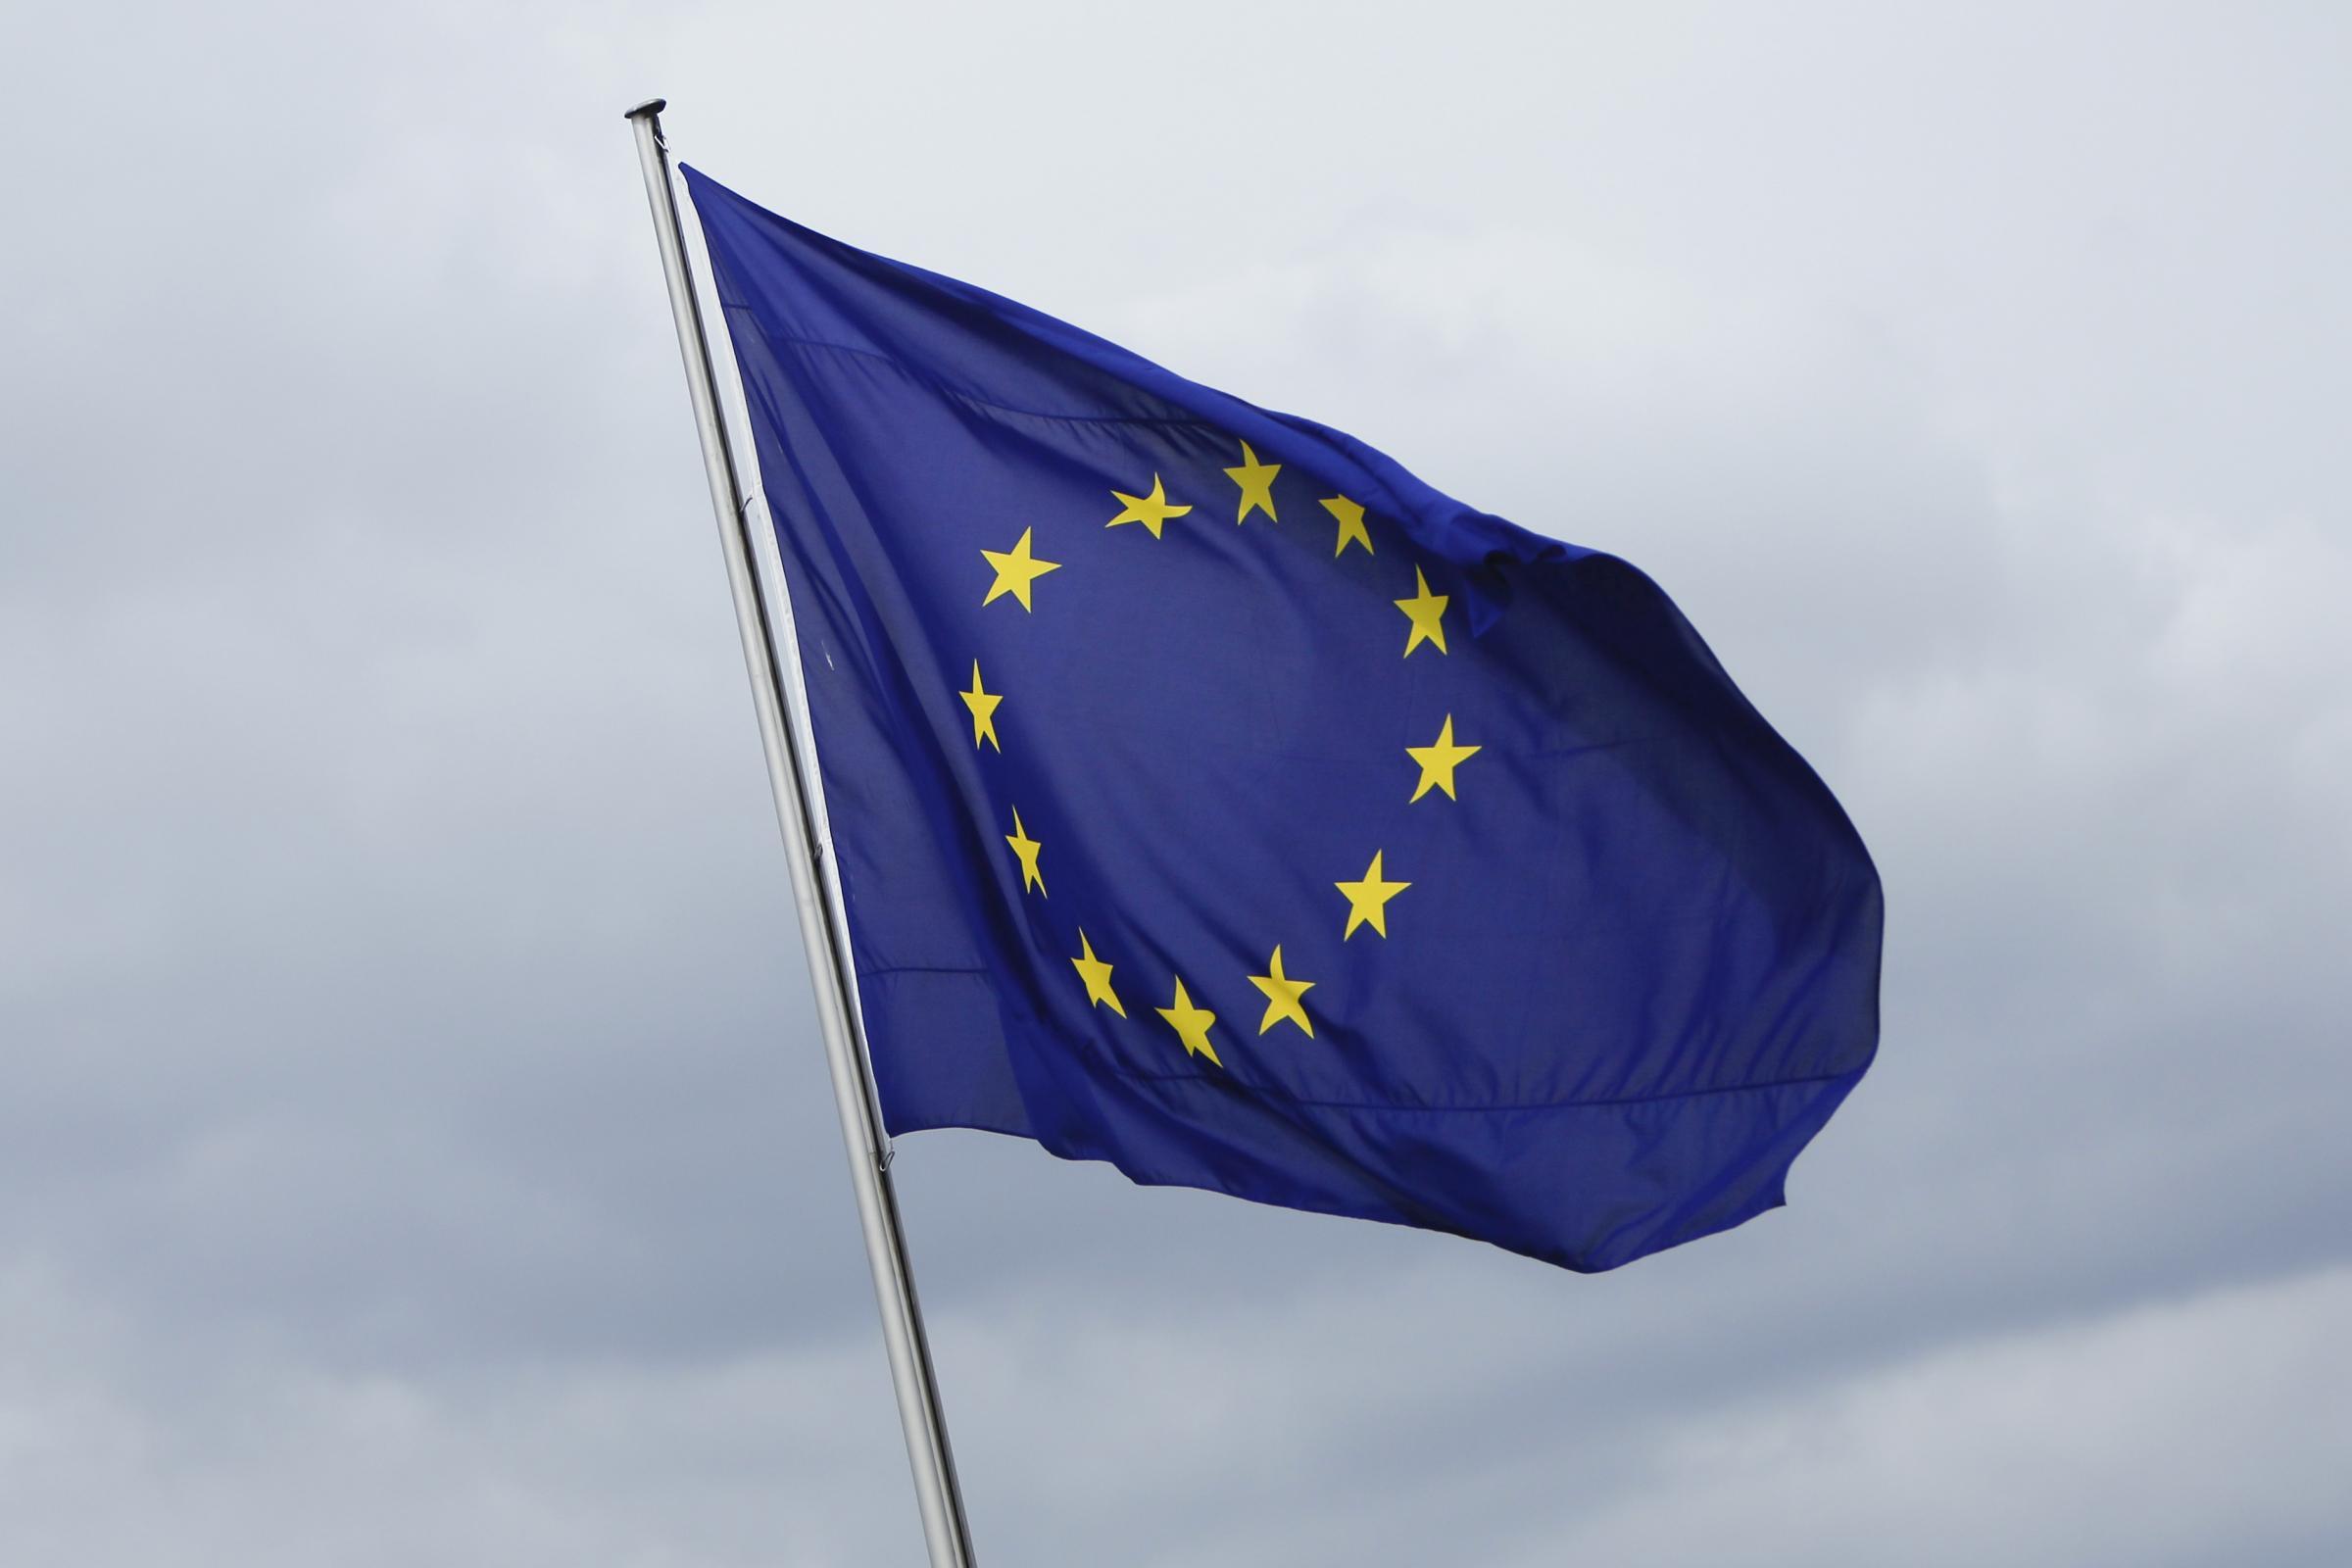 euro-campiglio-europa-bandiera-crisi-jpg-crop_display